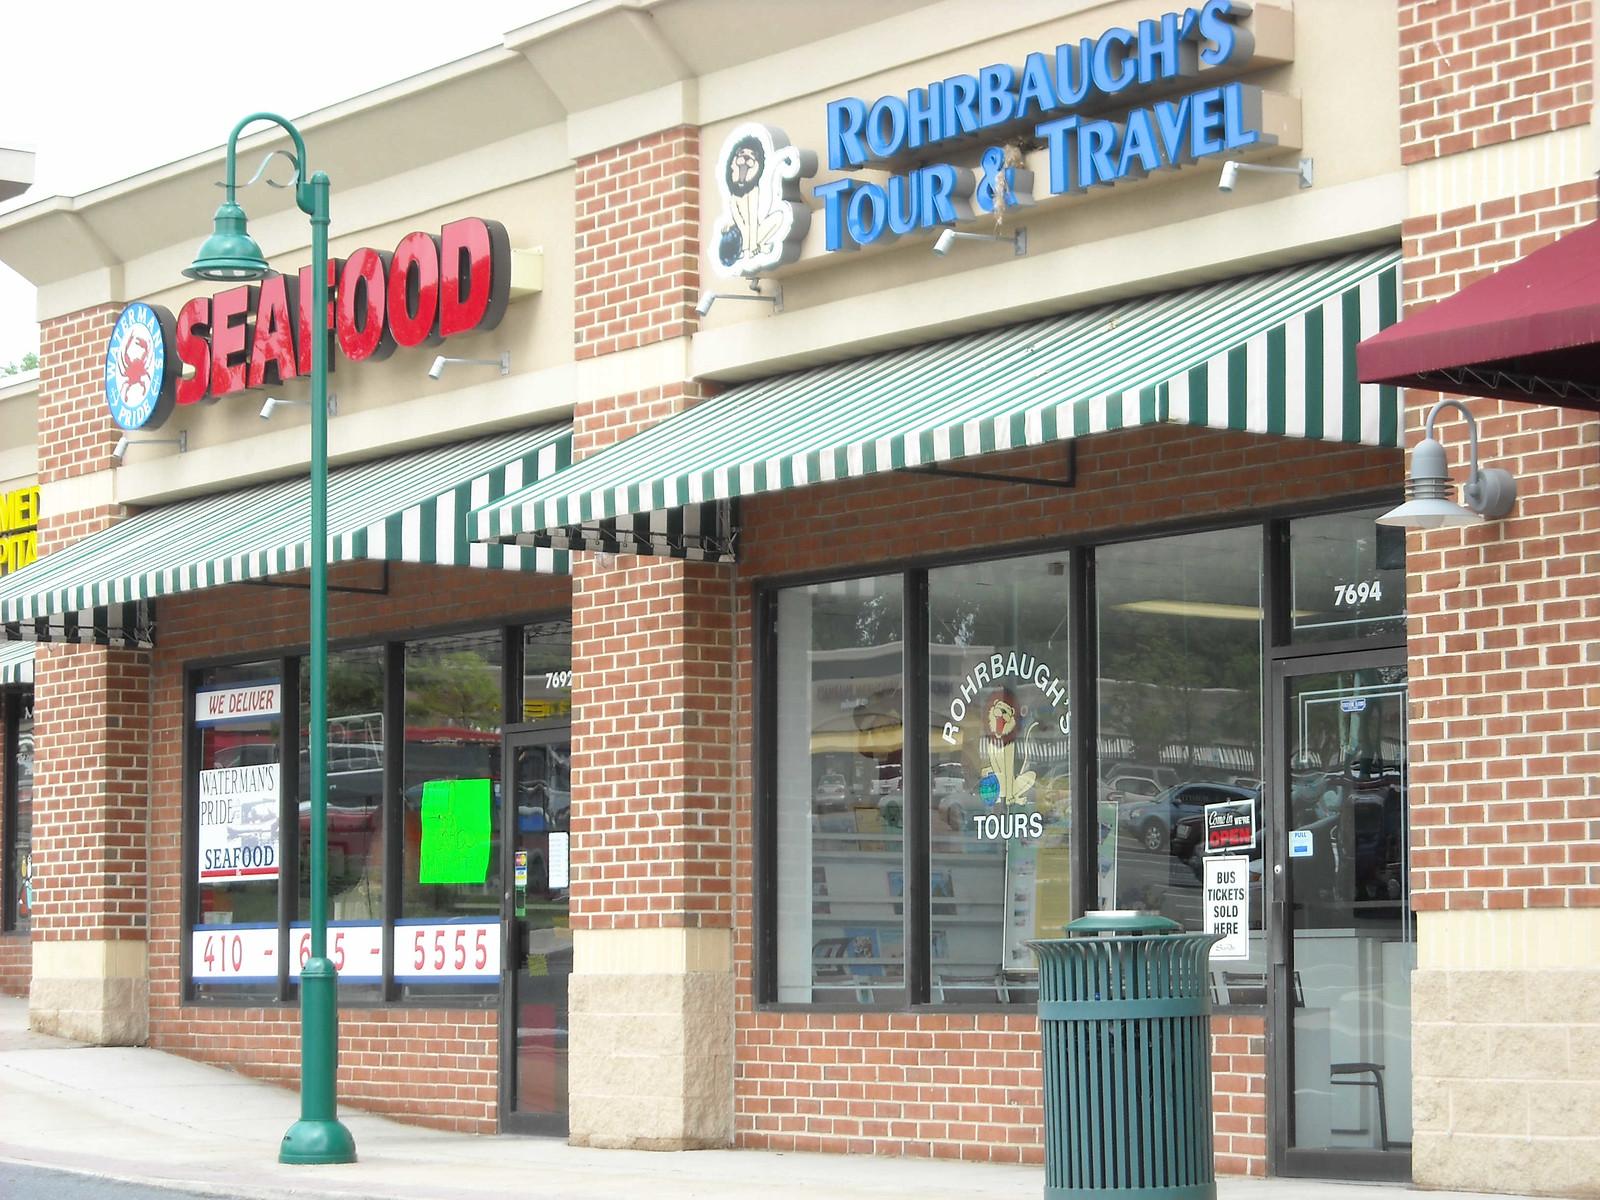 Shopping Mall Storefront -Hoffman Awning Baltimore